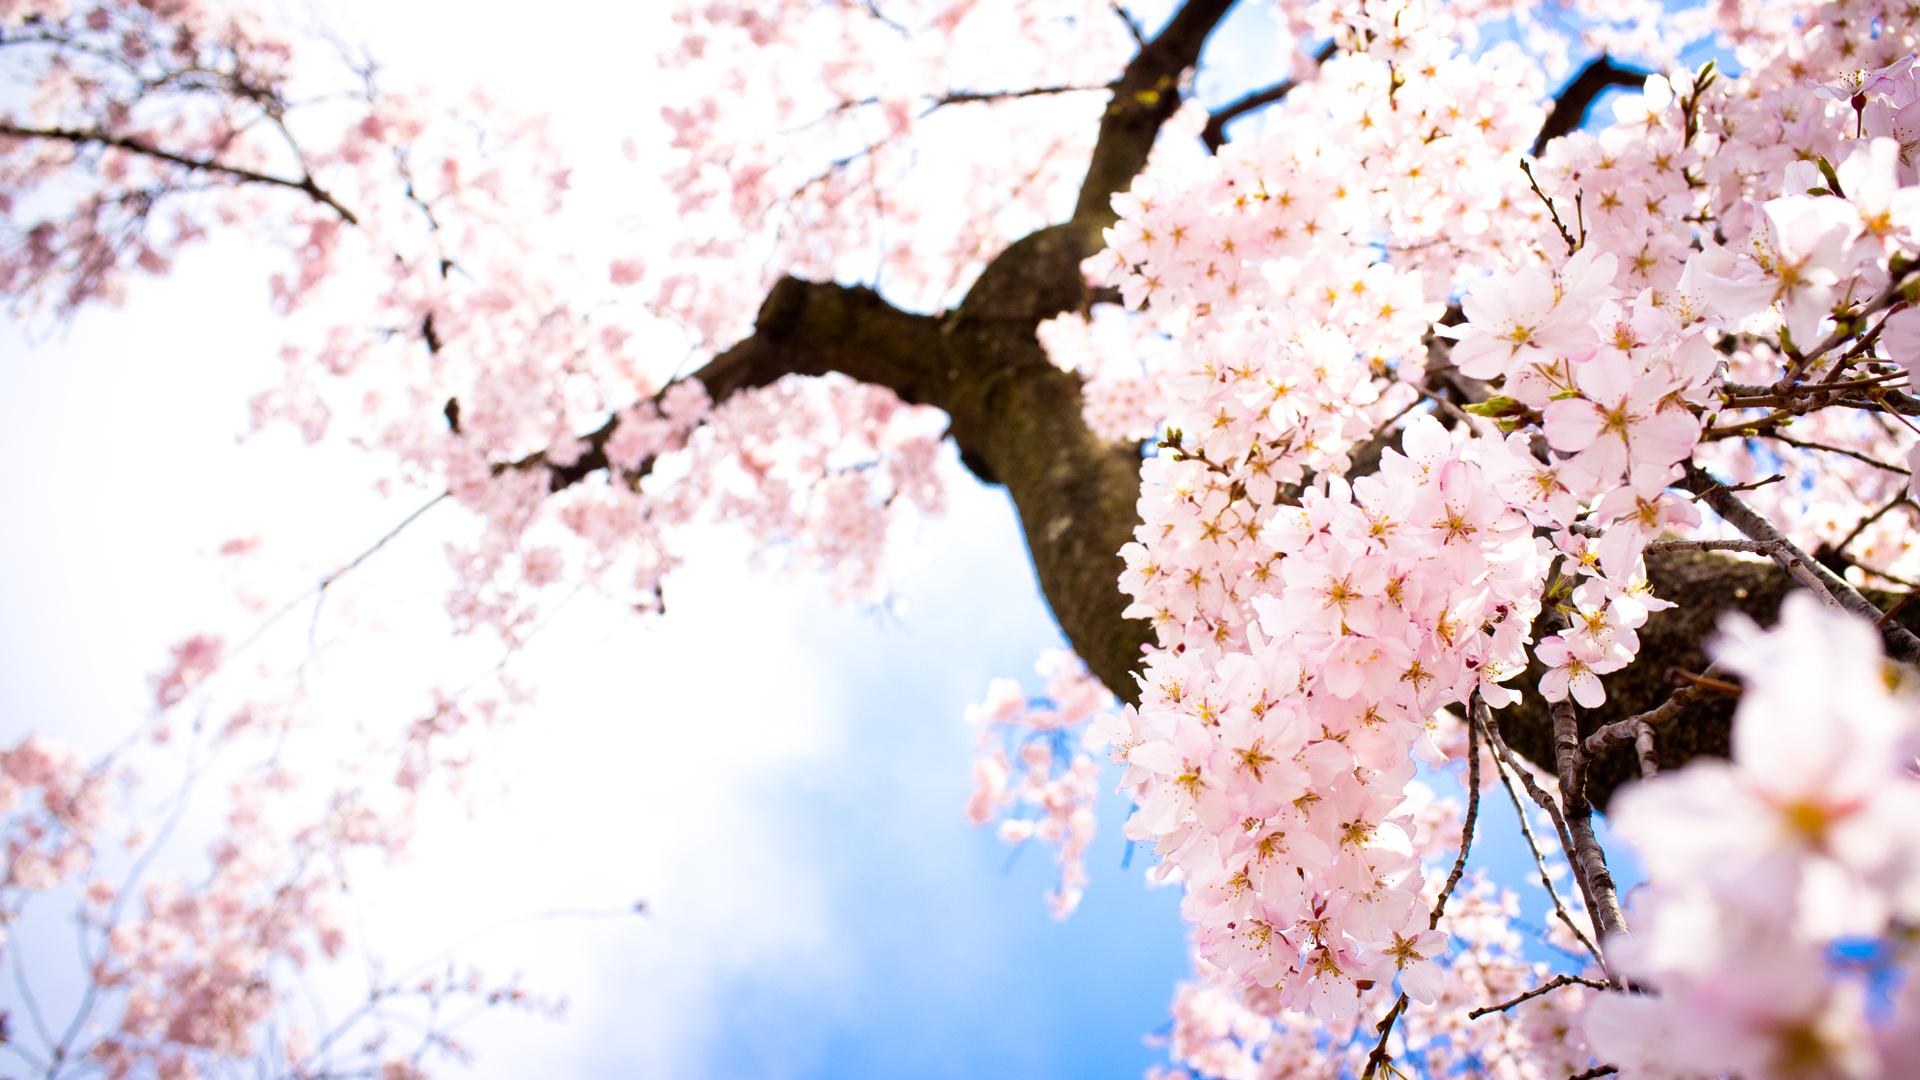 Sakura Flower Images